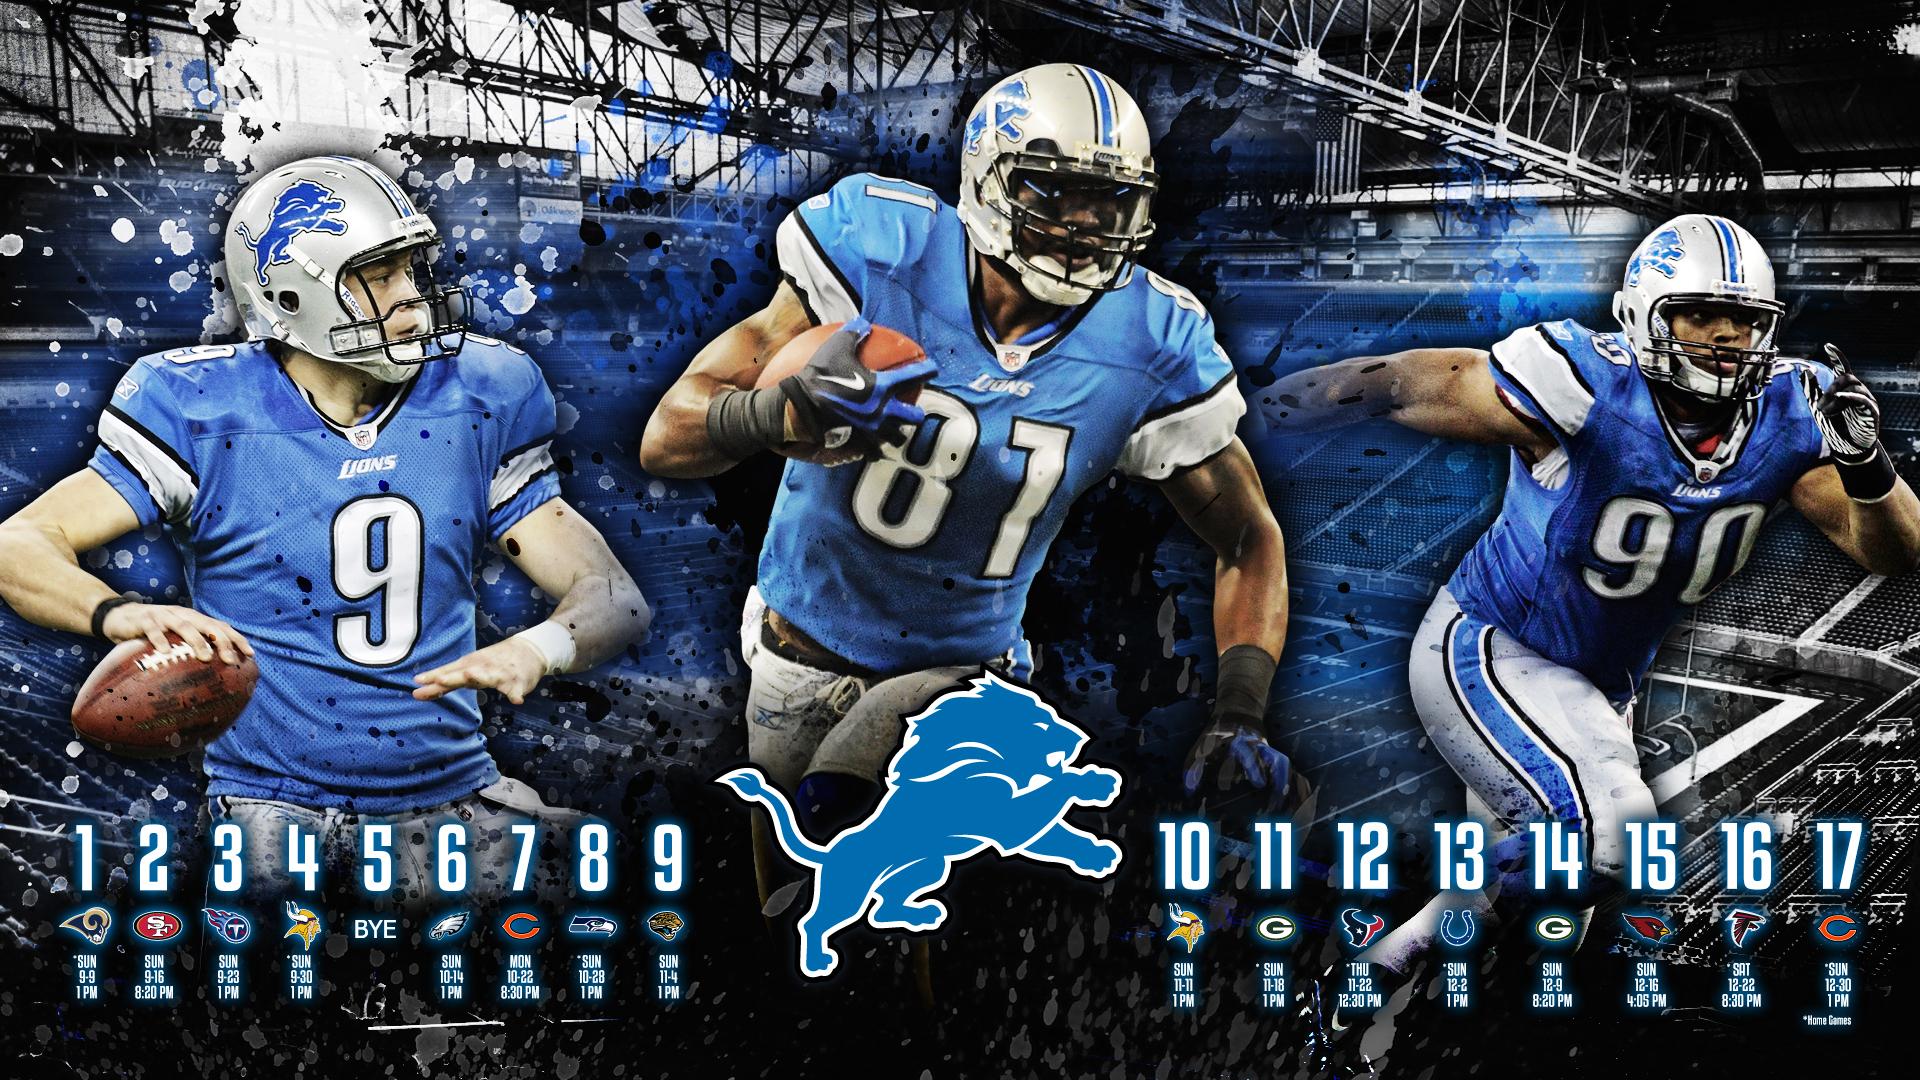 Detroit Lions HD Wallpaper   2012 Schedule by madeofglass13 on 1920x1080